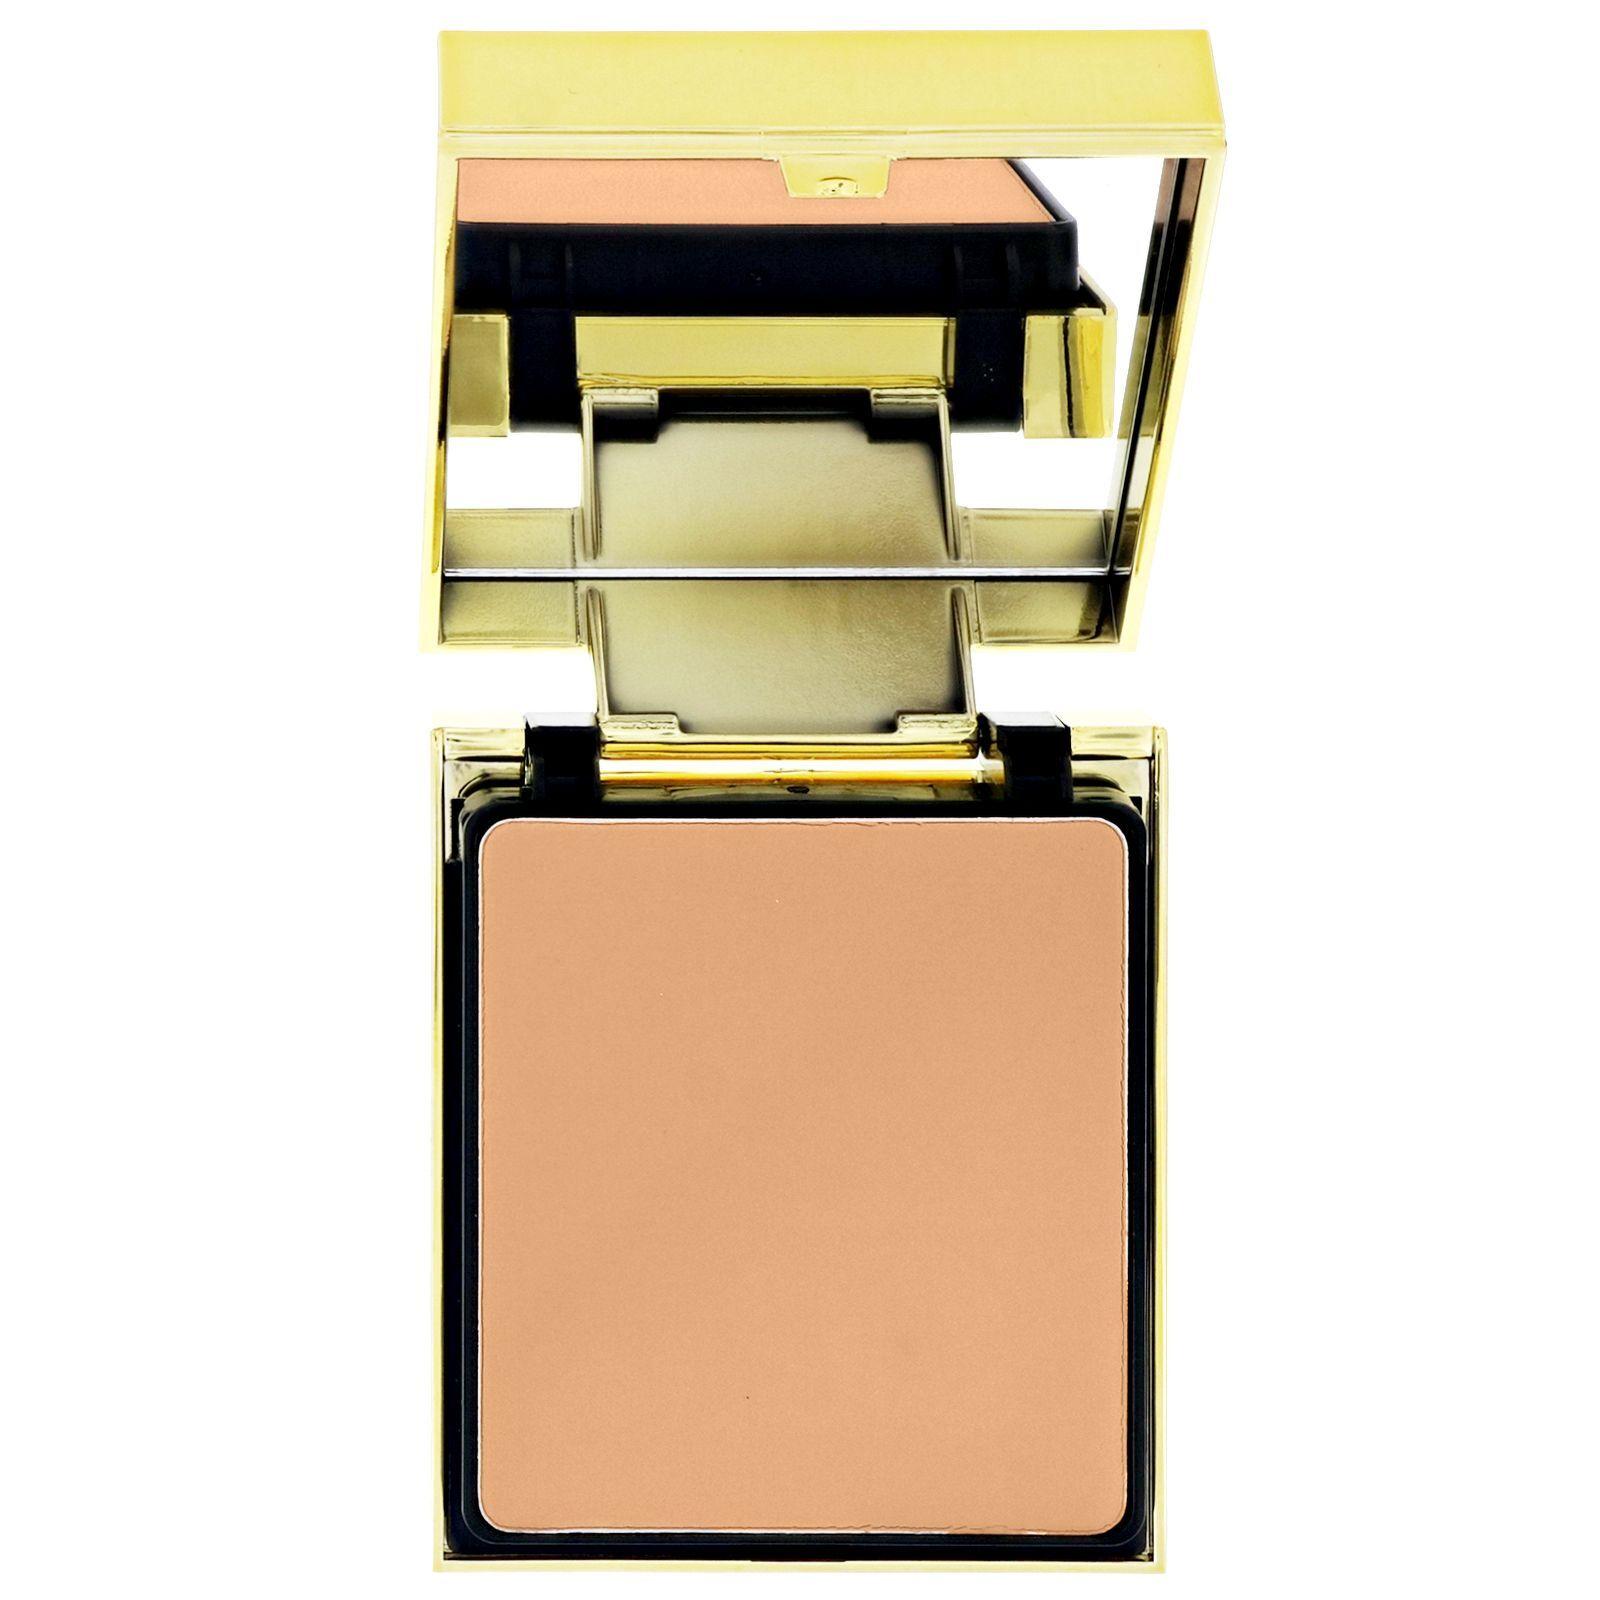 Elisabeth Arden - Flawless Finish Sponge-On Cream Makeup New Packaging 09 Honey Beige 23g / 0.8 oz.  for Women